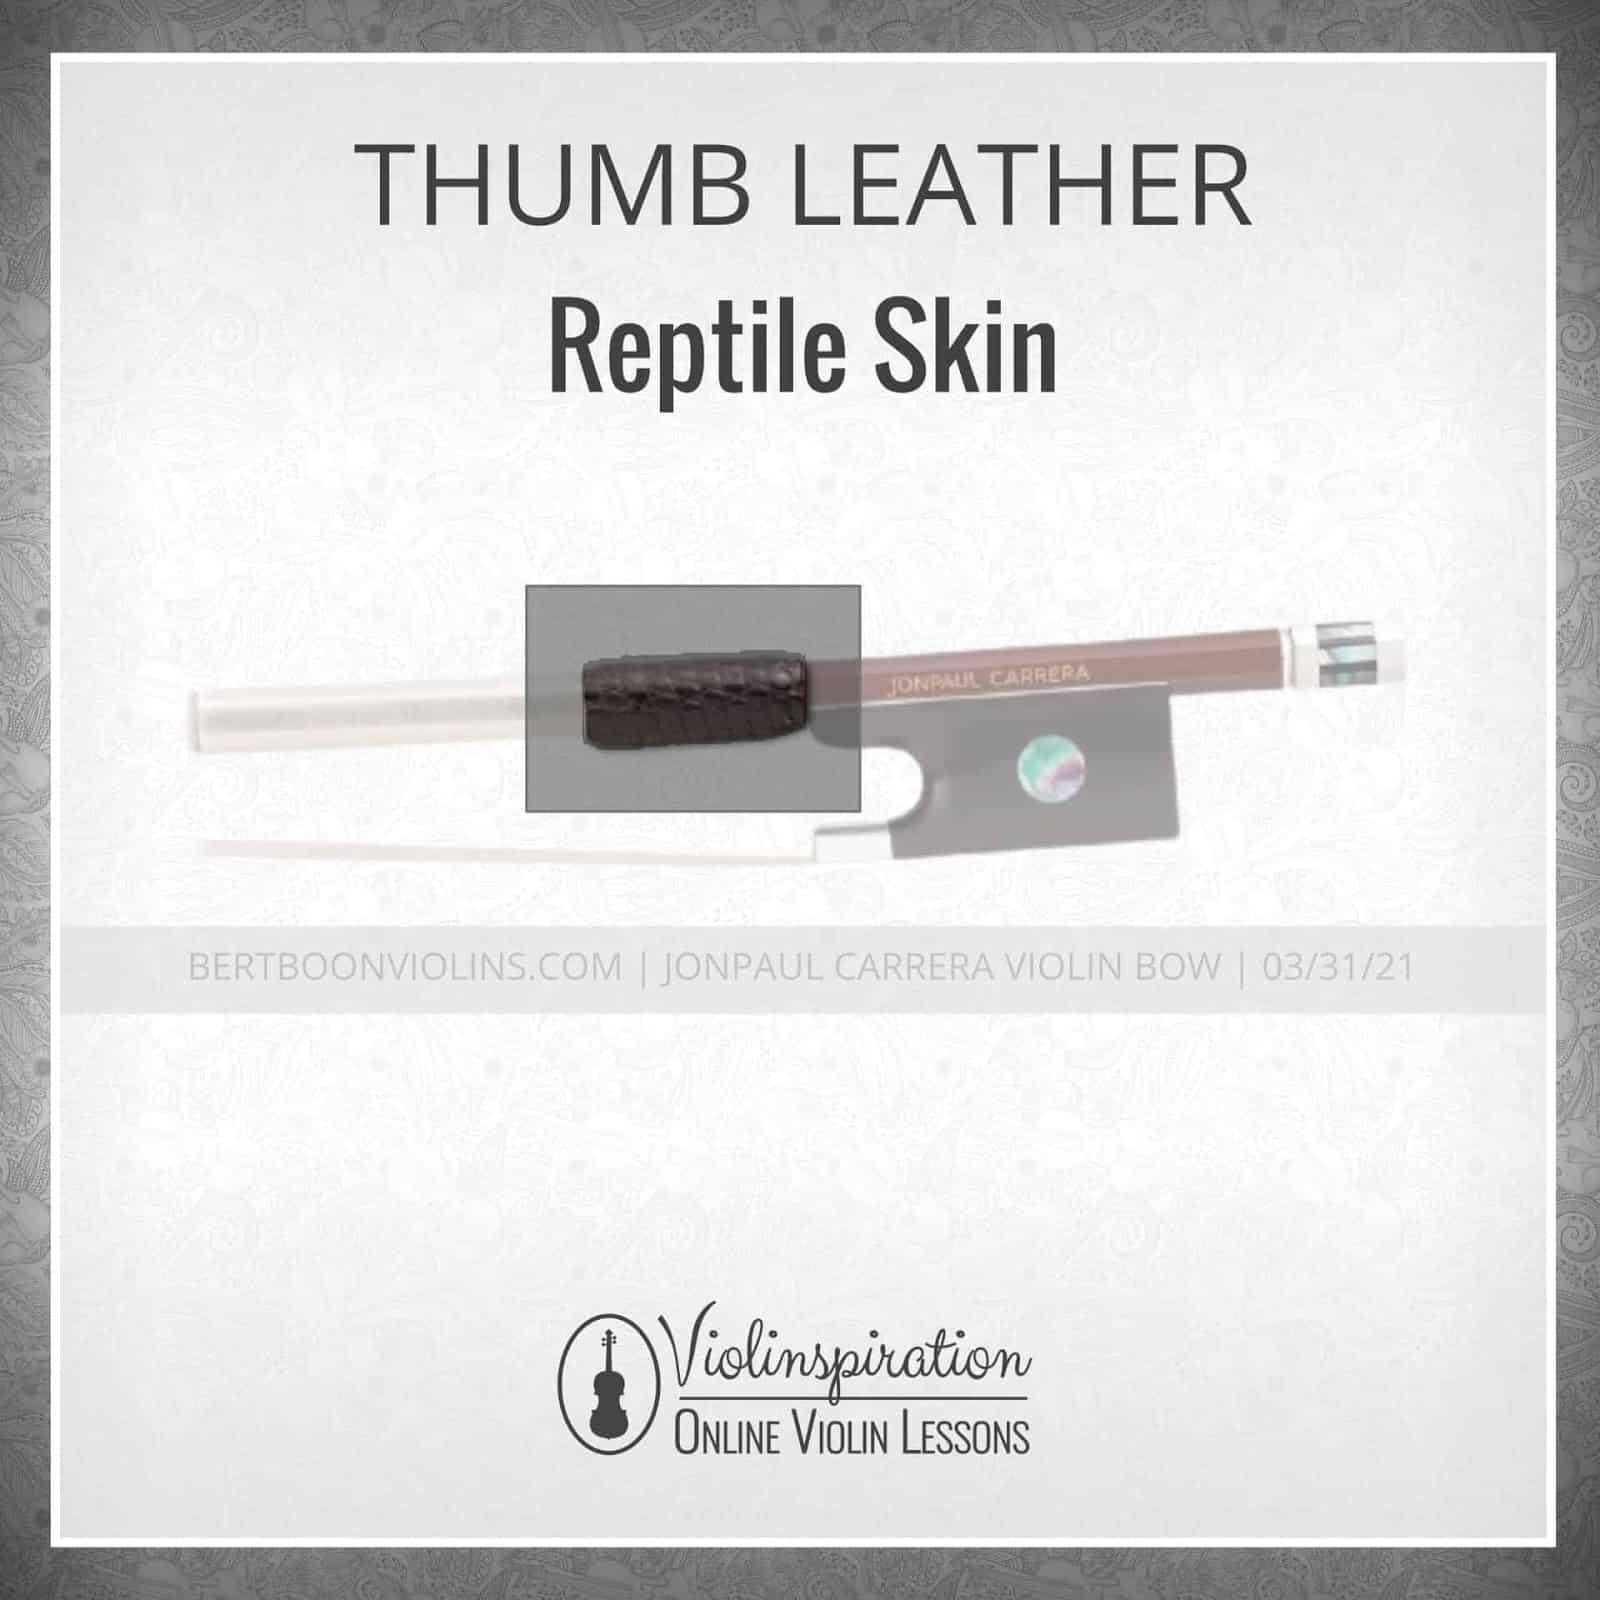 Violin Bow Materials - Thumb Leather - Reptile Skin